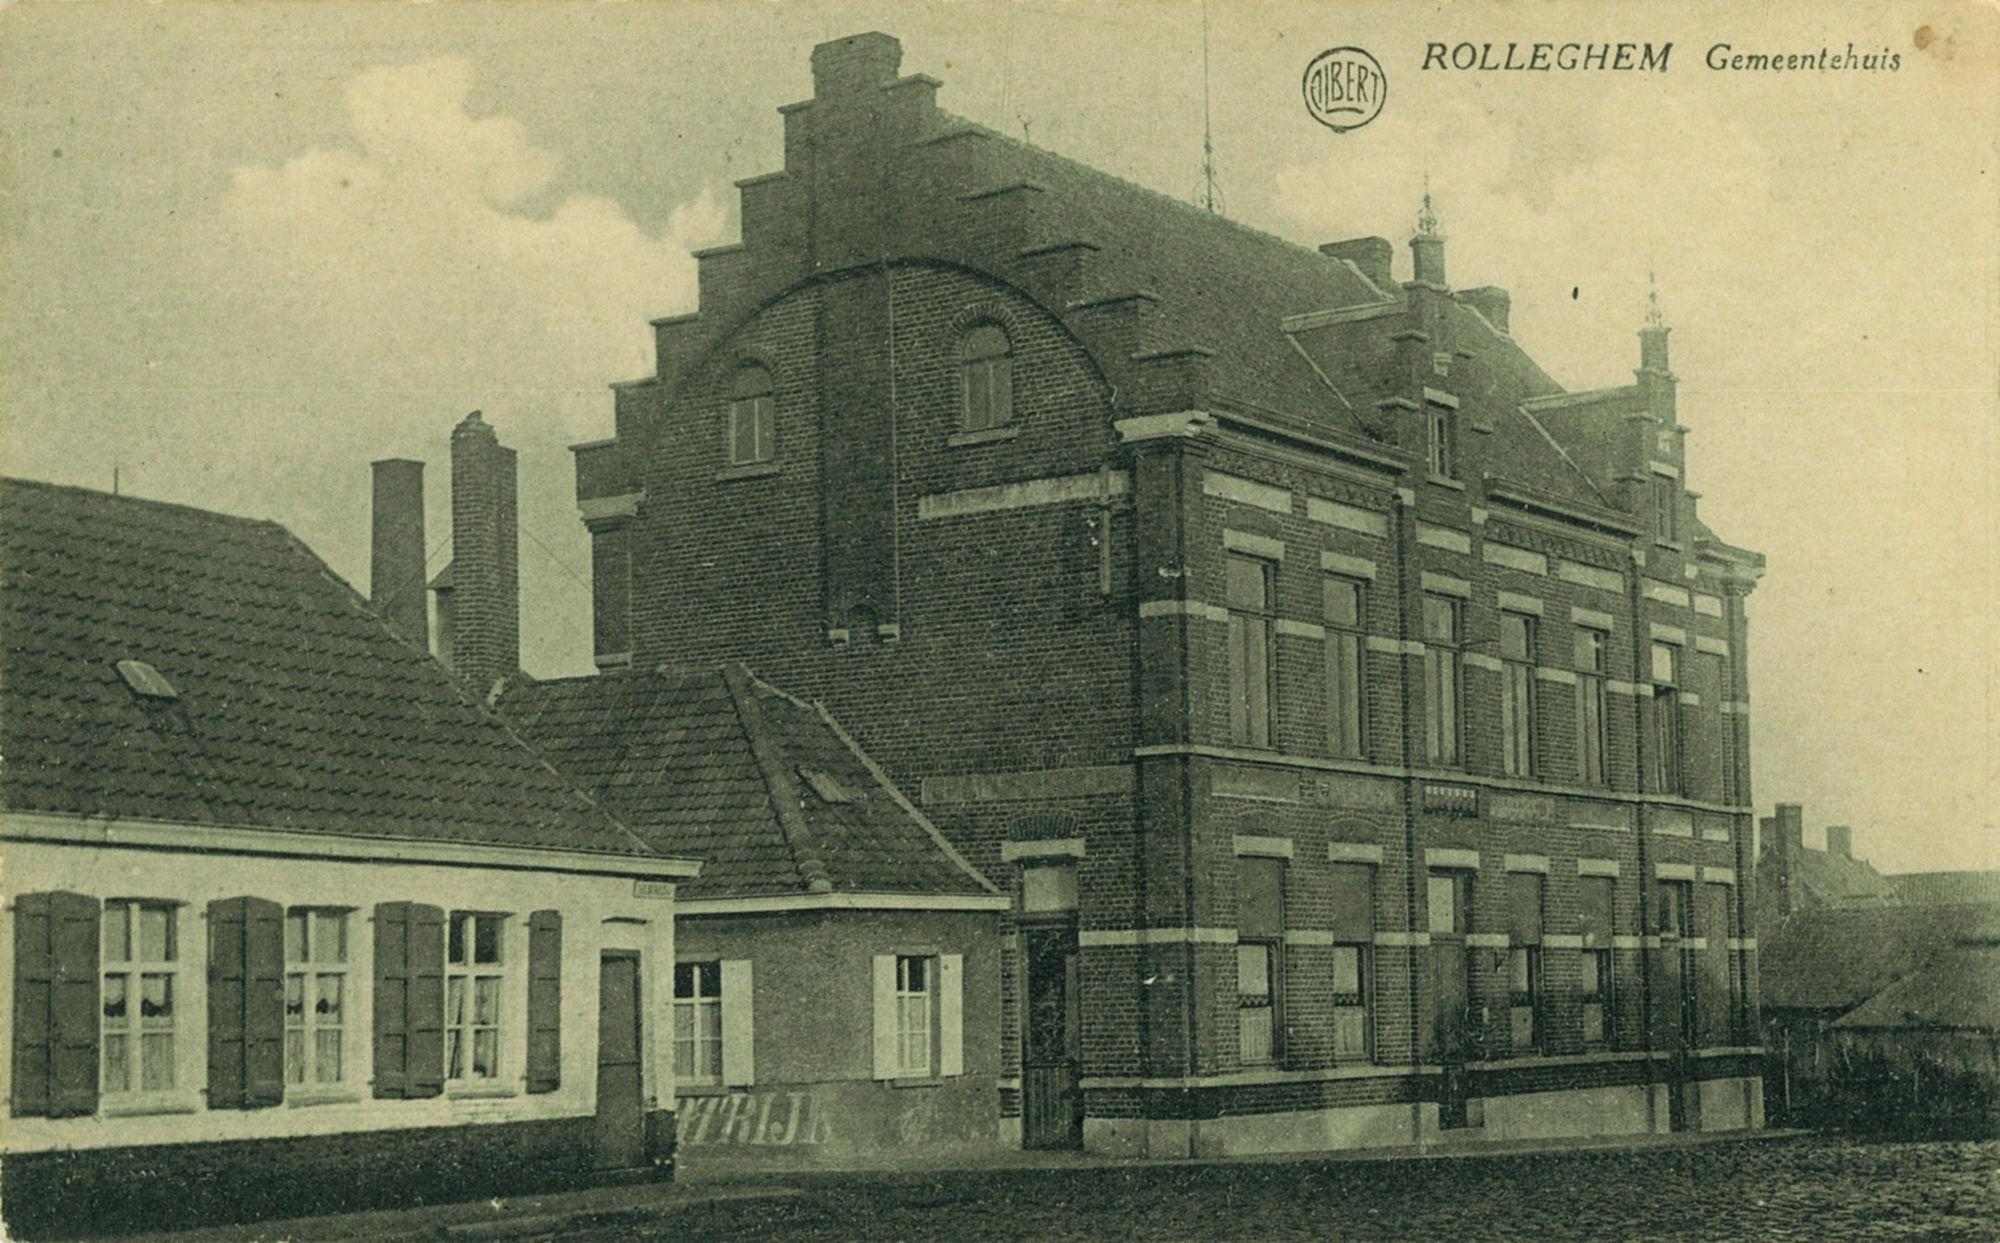 Rollegem Gemeentehuis van Rollegem